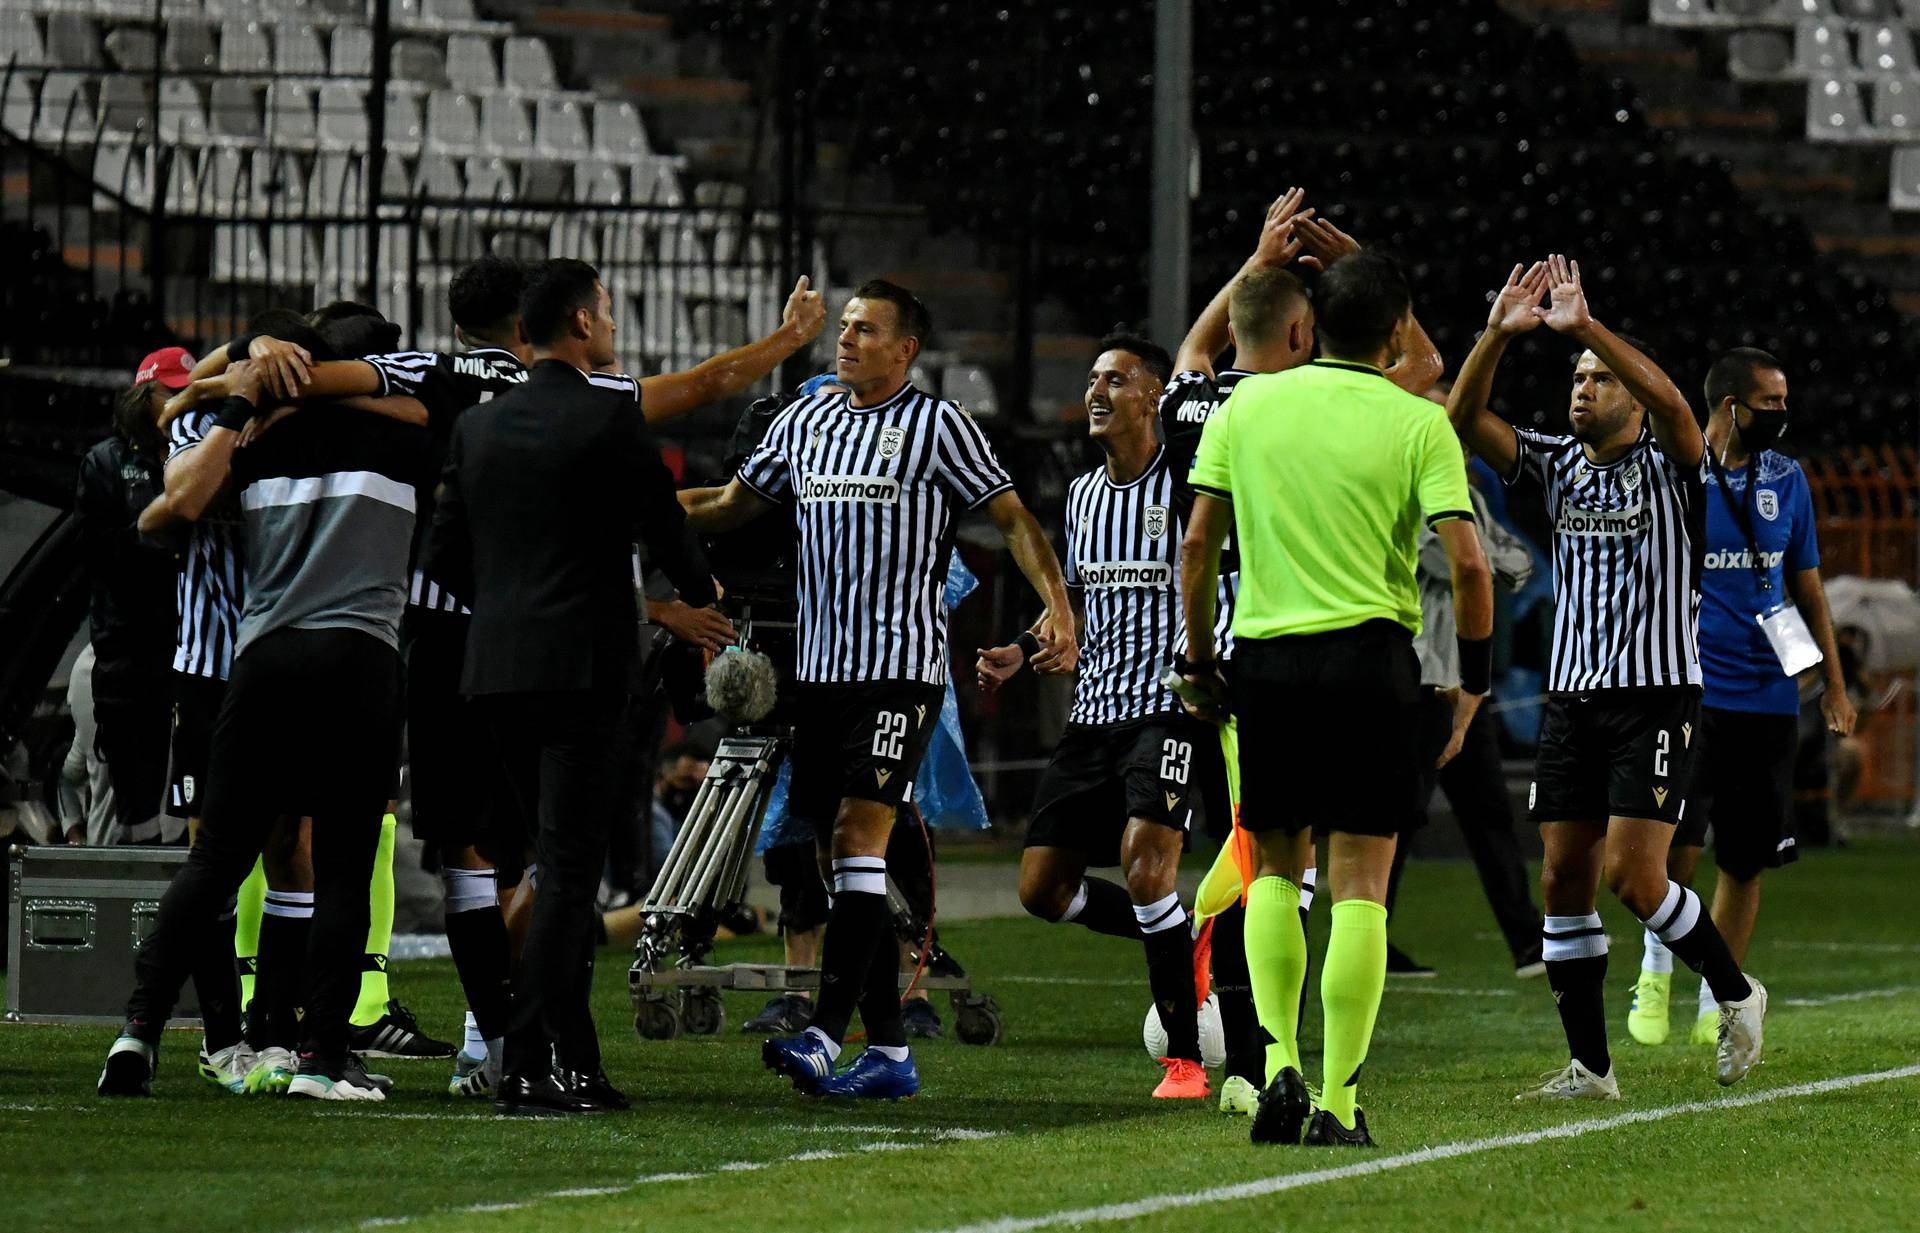 Champions League - Second Qualifying Round - PAOK v Besiktas